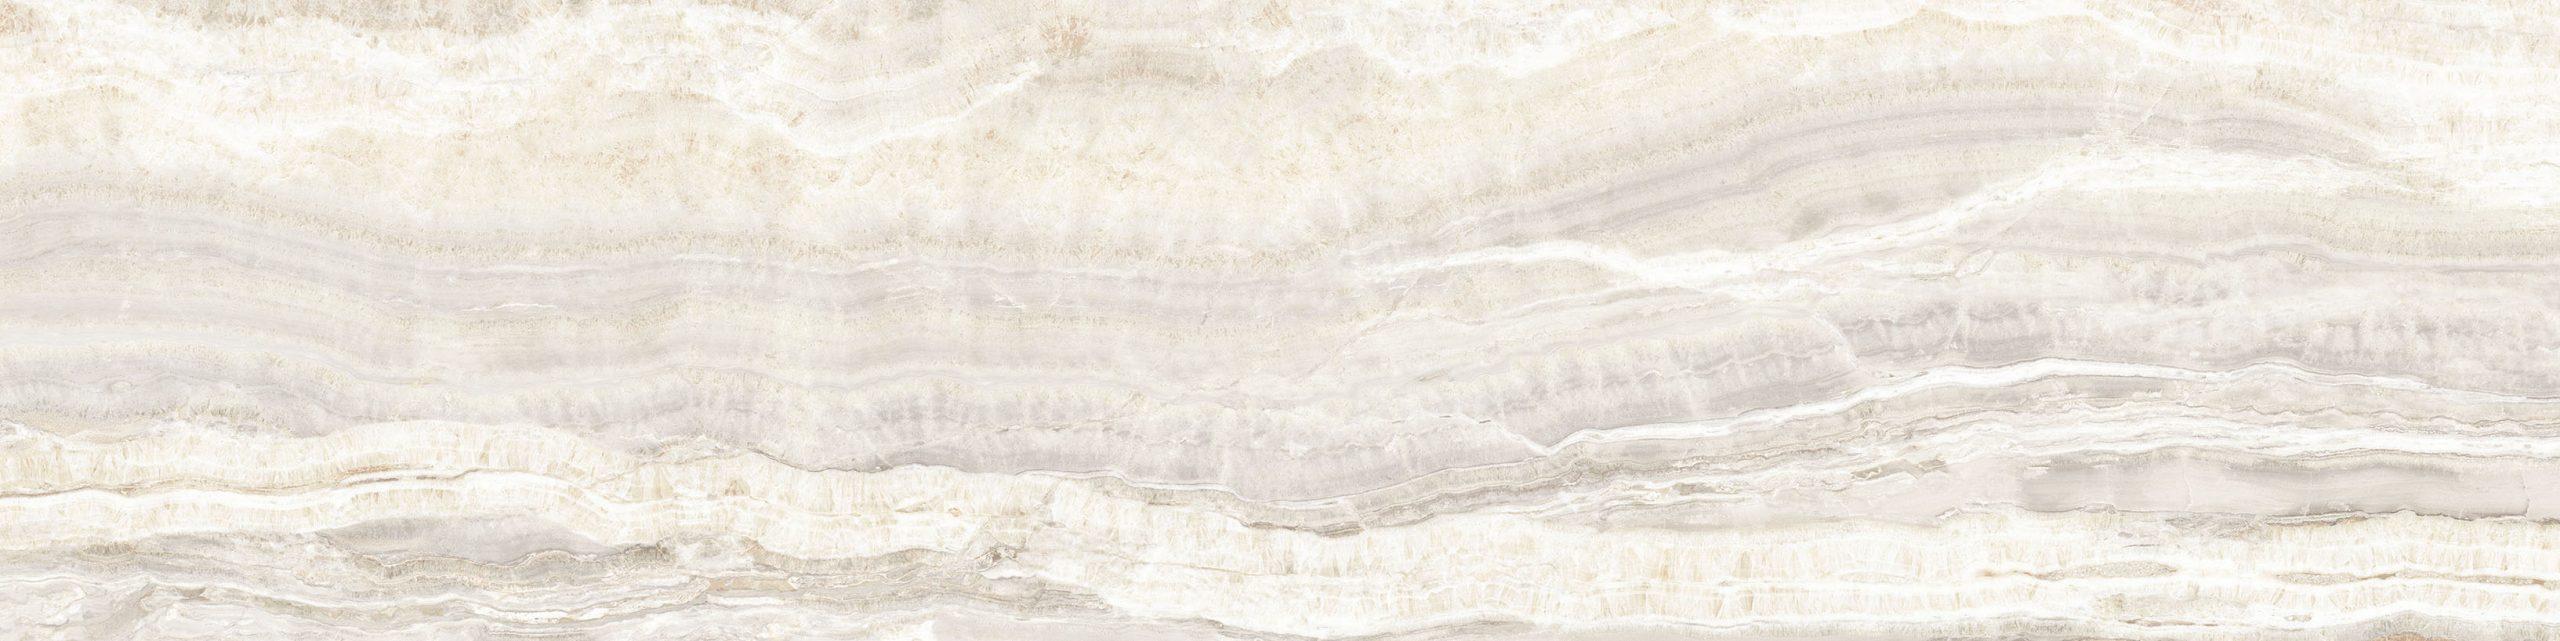 Onyx of Cerim Sand Glossy 10mm 30 x 120